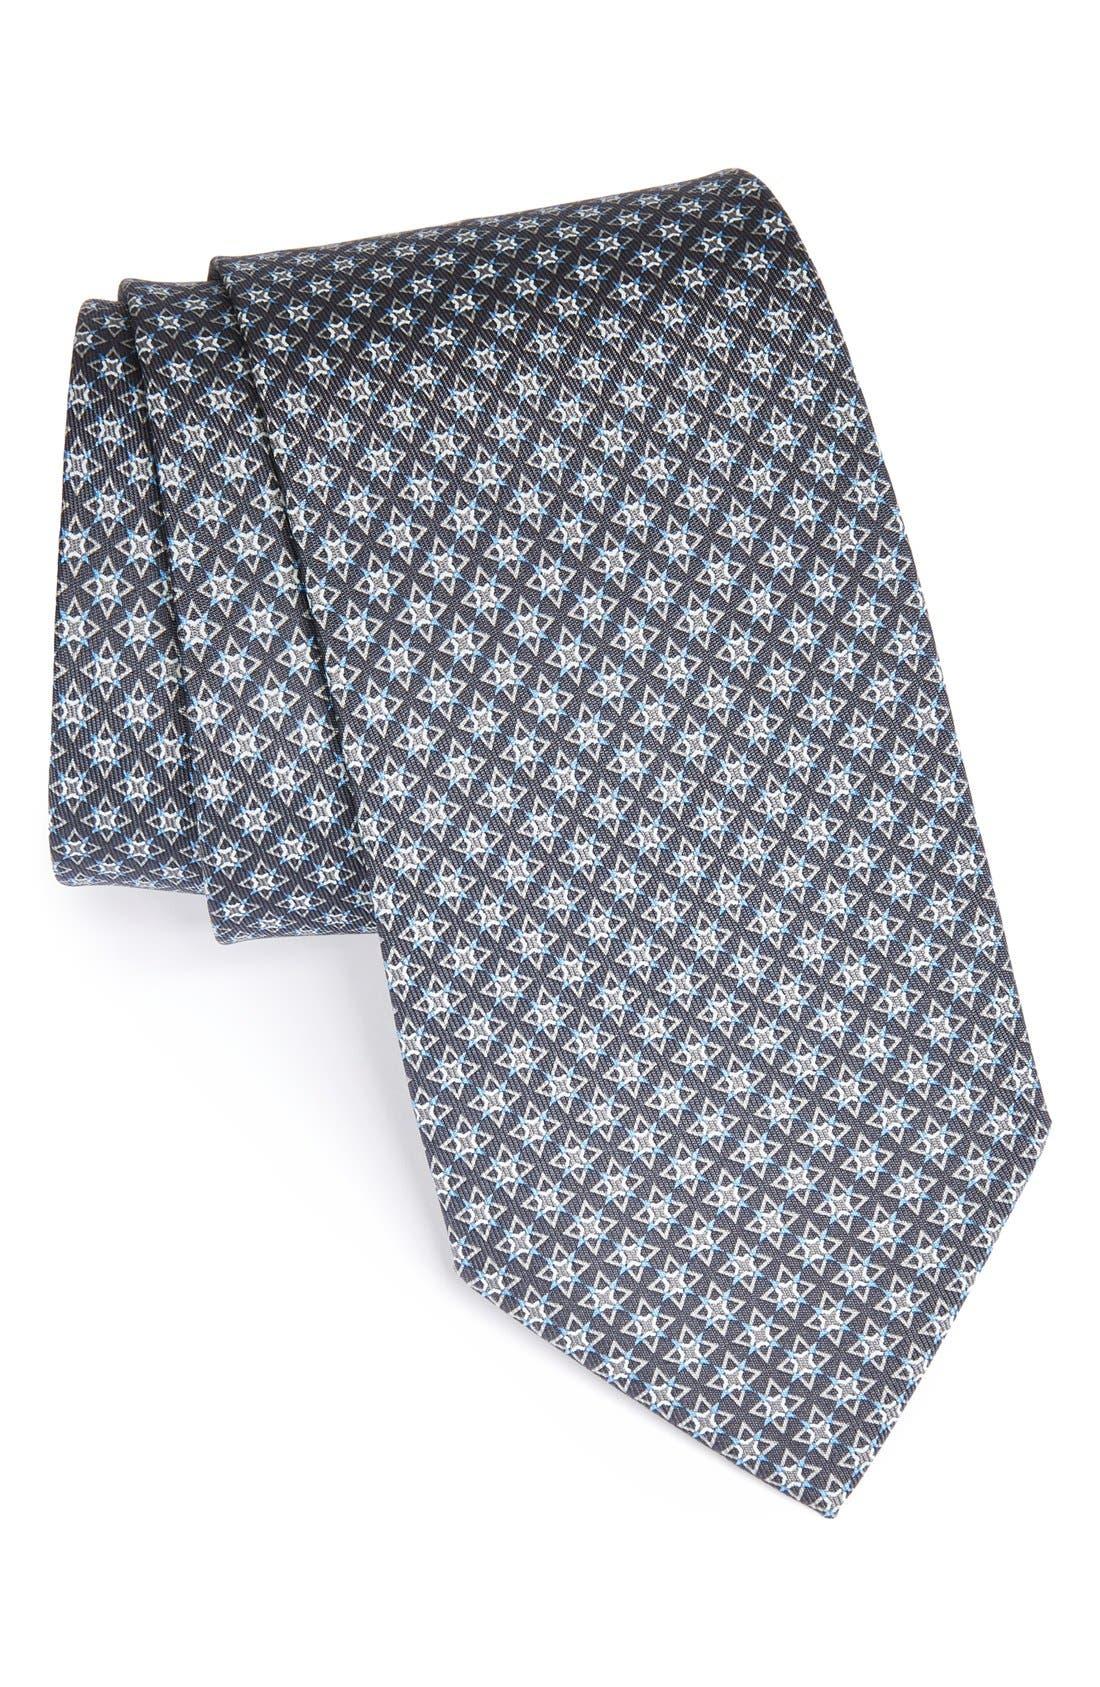 Alternate Image 1 Selected - Salvatore Ferragamo Star Print Silk Tie